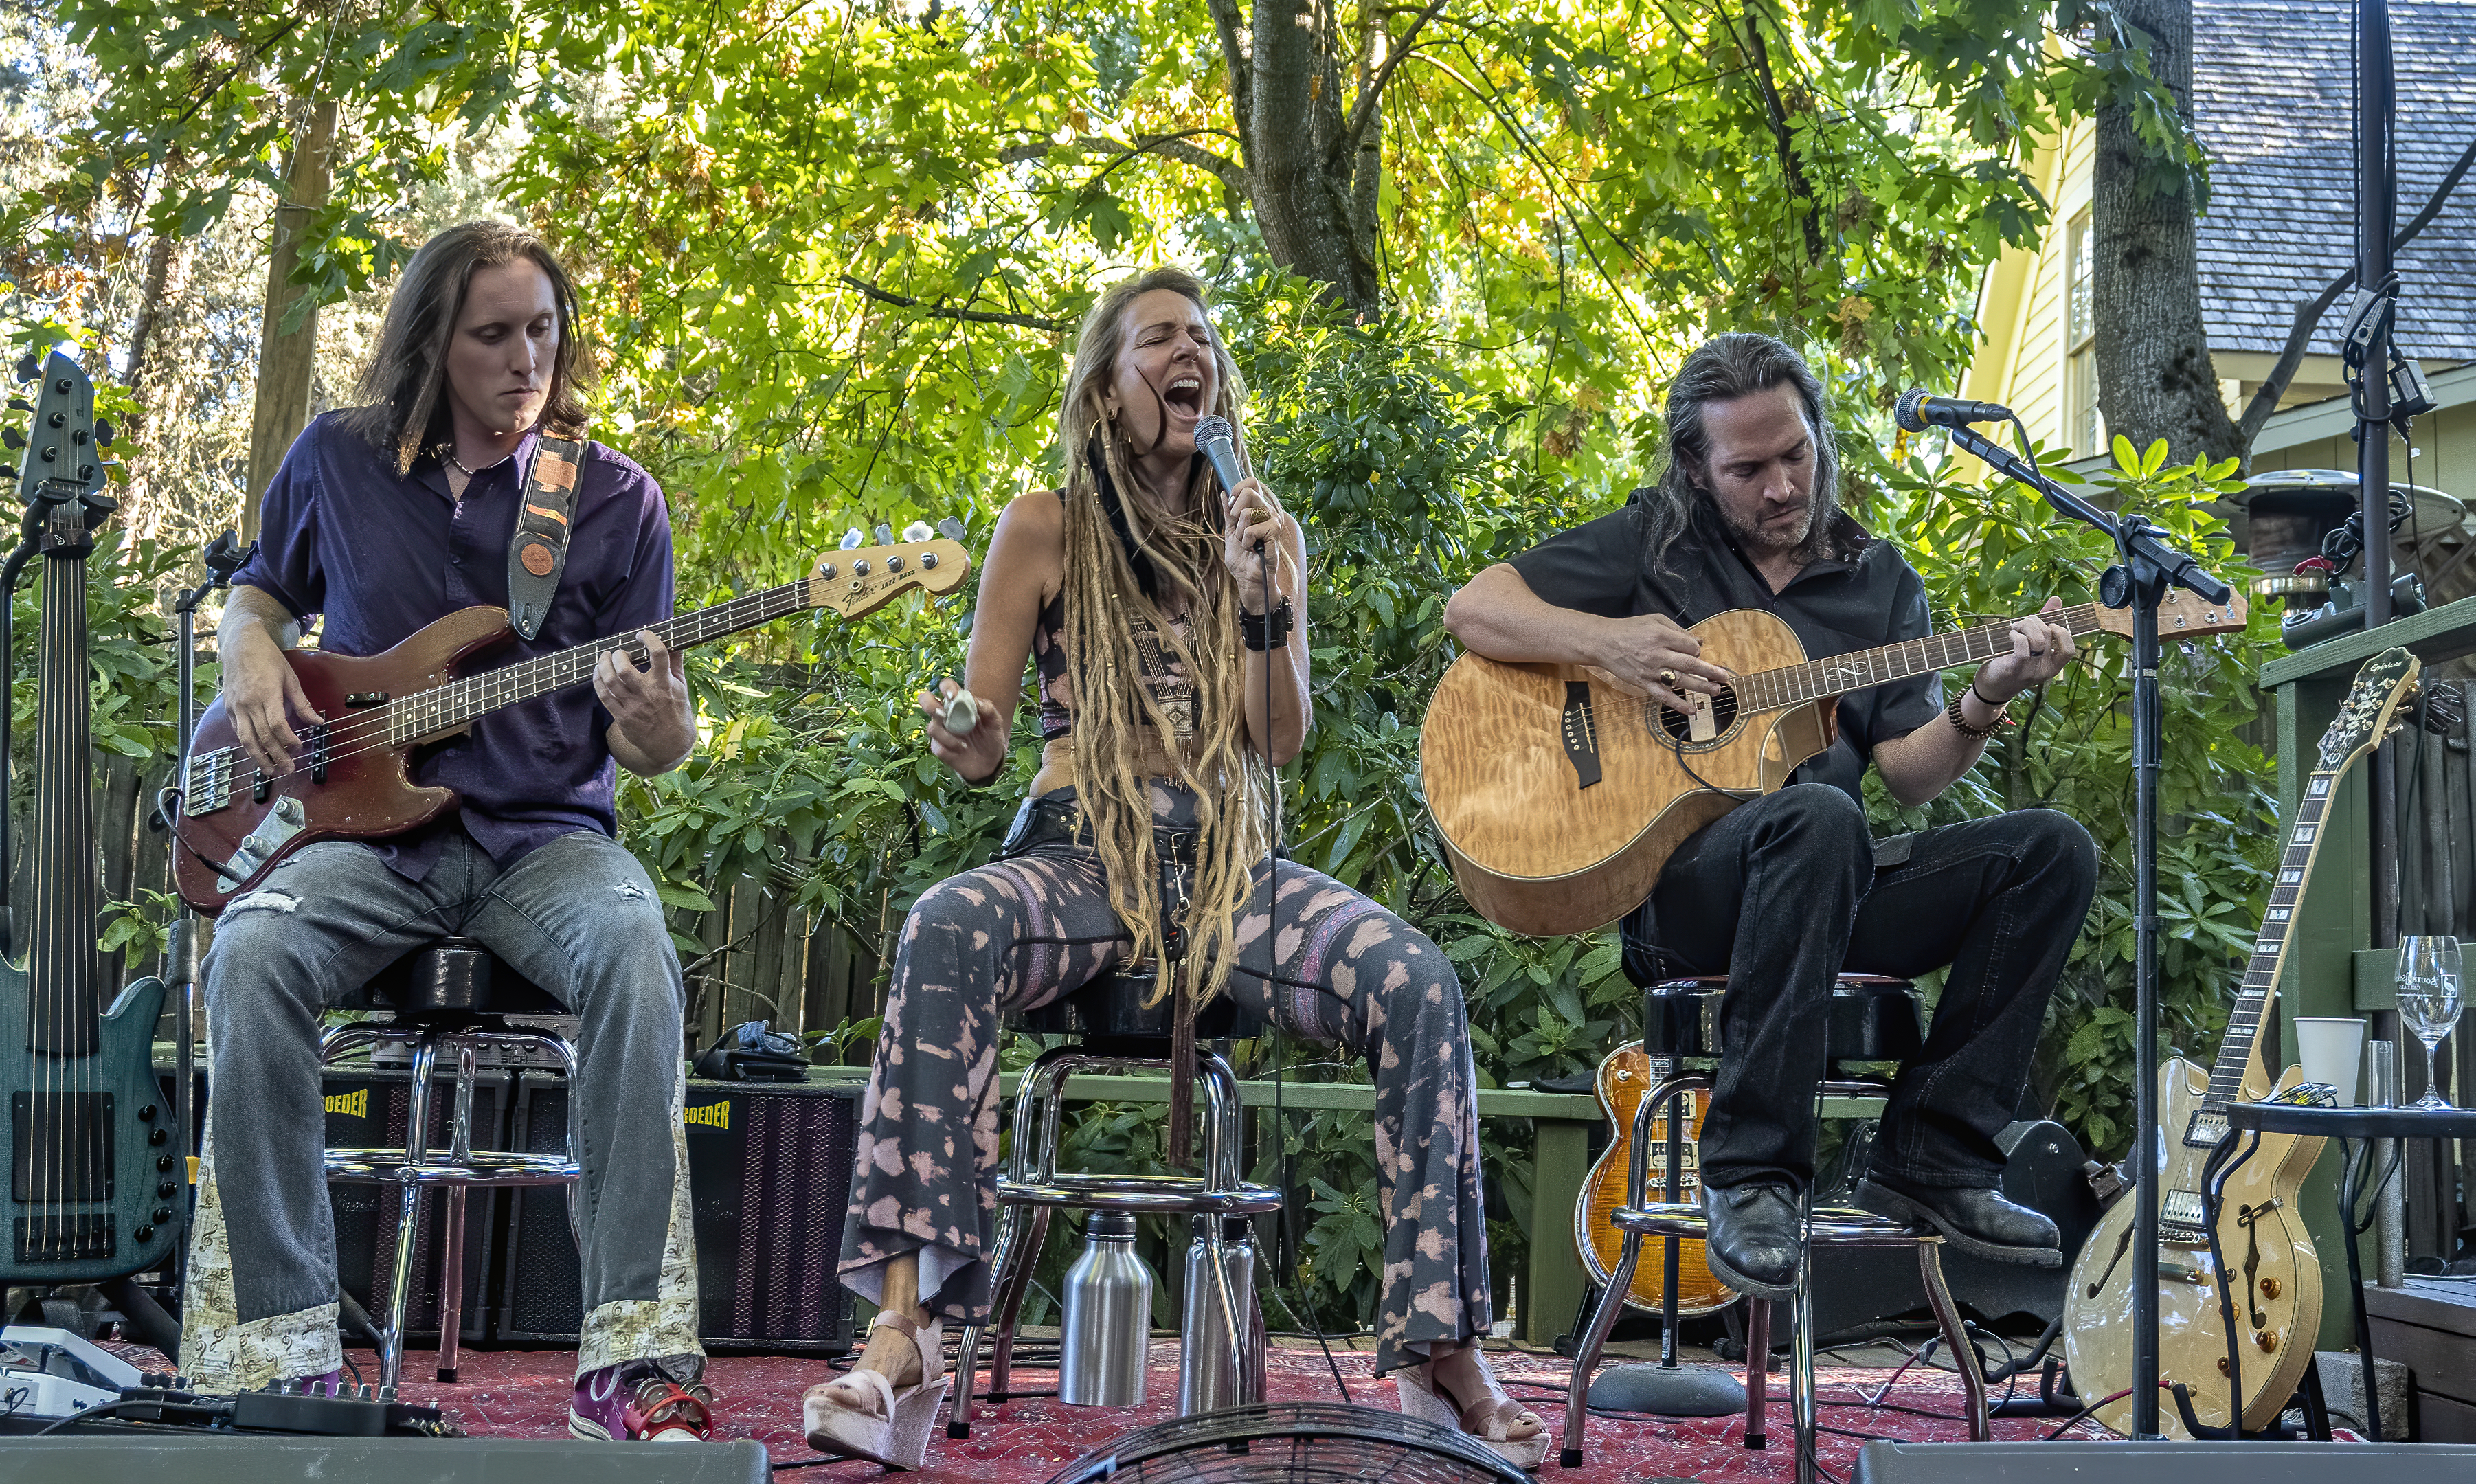 Living Loving Led trio ANTHONY CUSENZA NATASHA LEE NEECE Mike Pugh south stage cellars topaz denoise ai-denoise